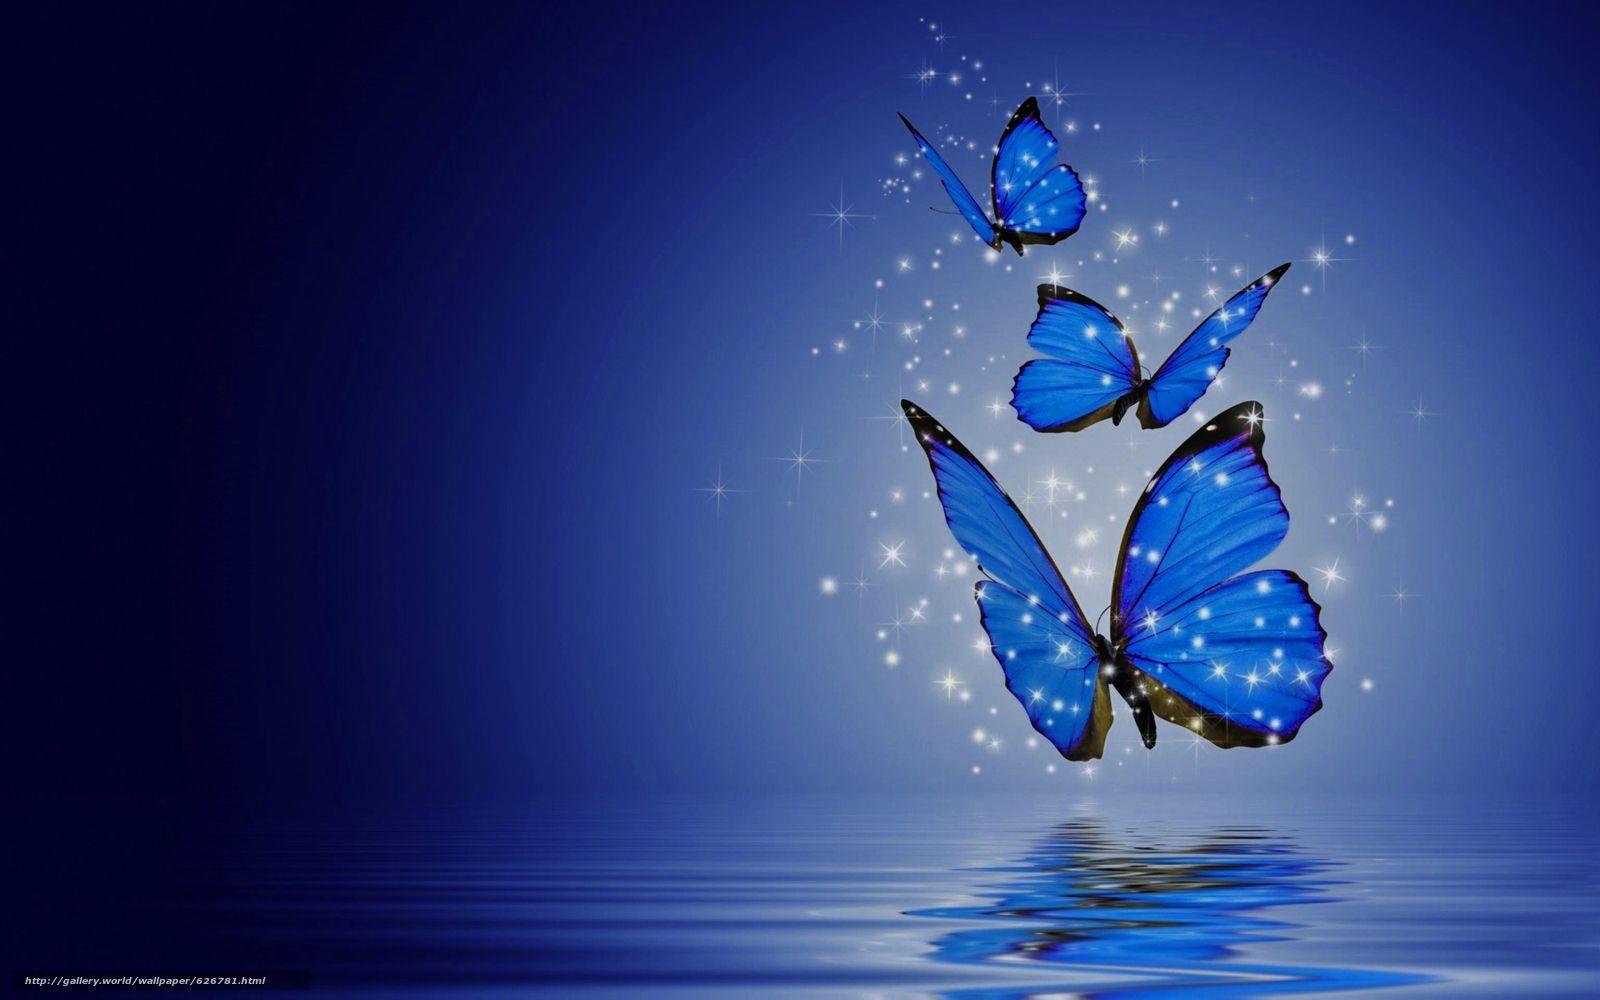 scaricare gli sfondi farfalle farfalle 3d sfondi gratis